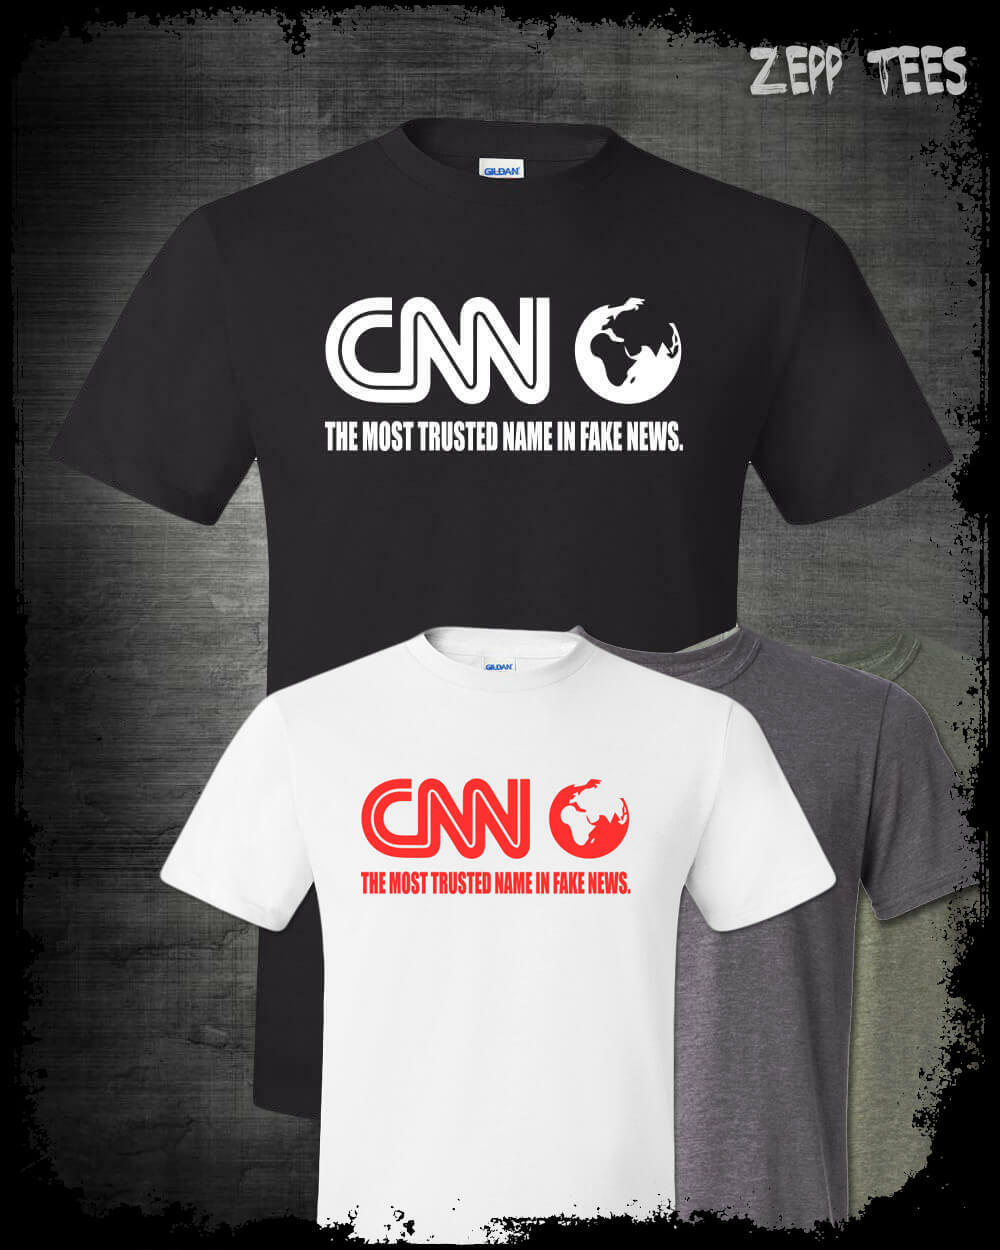 CNN Fake News Network T-Shirt Funny Meme Fraud Corrupt Liberal M5M Media  Trump